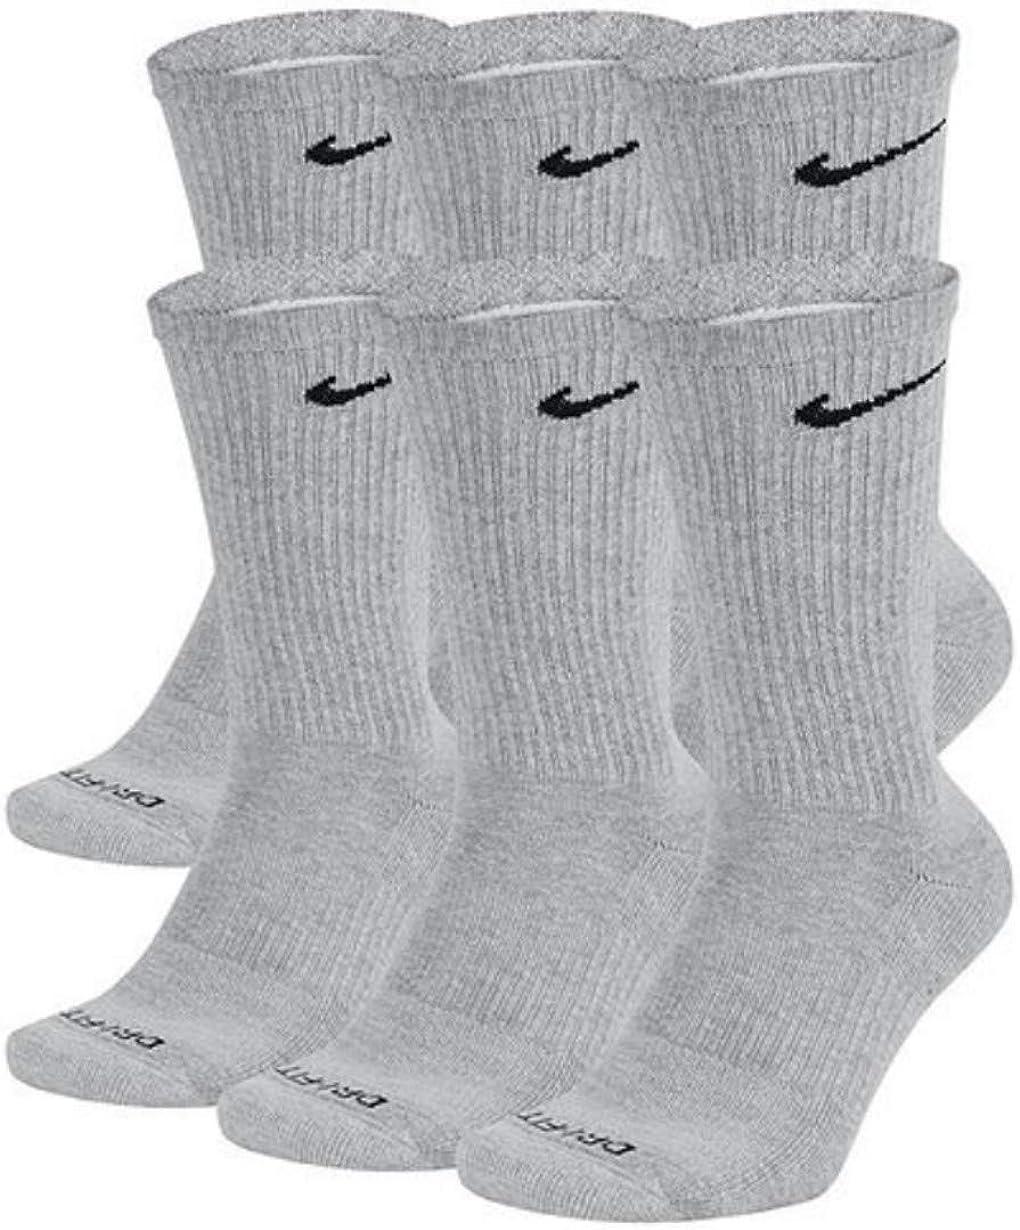 NIKE Dri-Fit Training Everyday PLUS MAX Cushioned Crew Socks 6 PAIR Wolf  Grey Black Swoosh Logo) LARGE 8-12